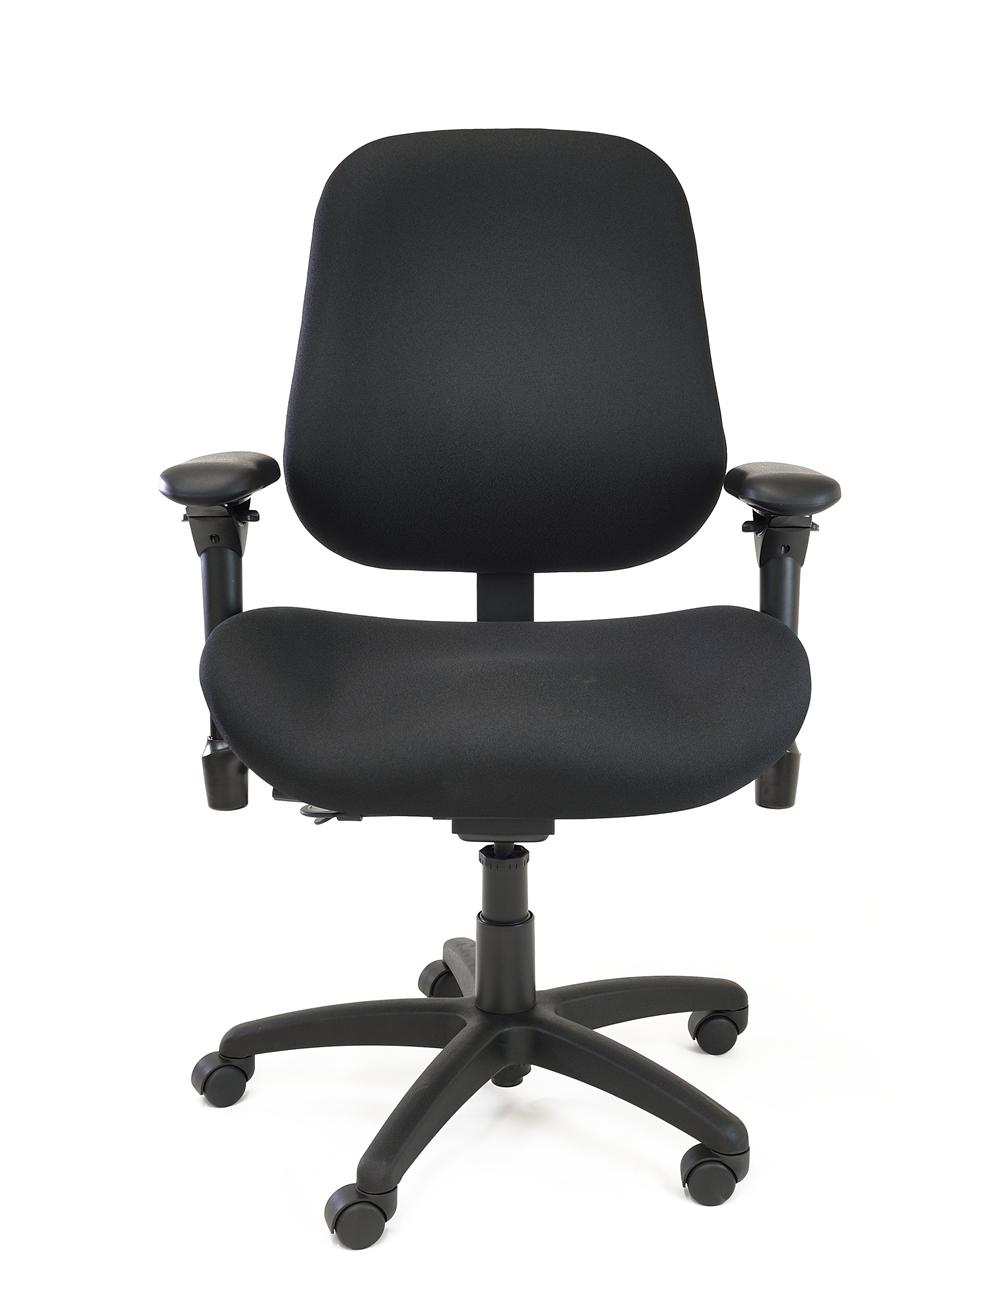 BodyBilt Big and Tall Office Chair J2504 | Heavy Duty ...